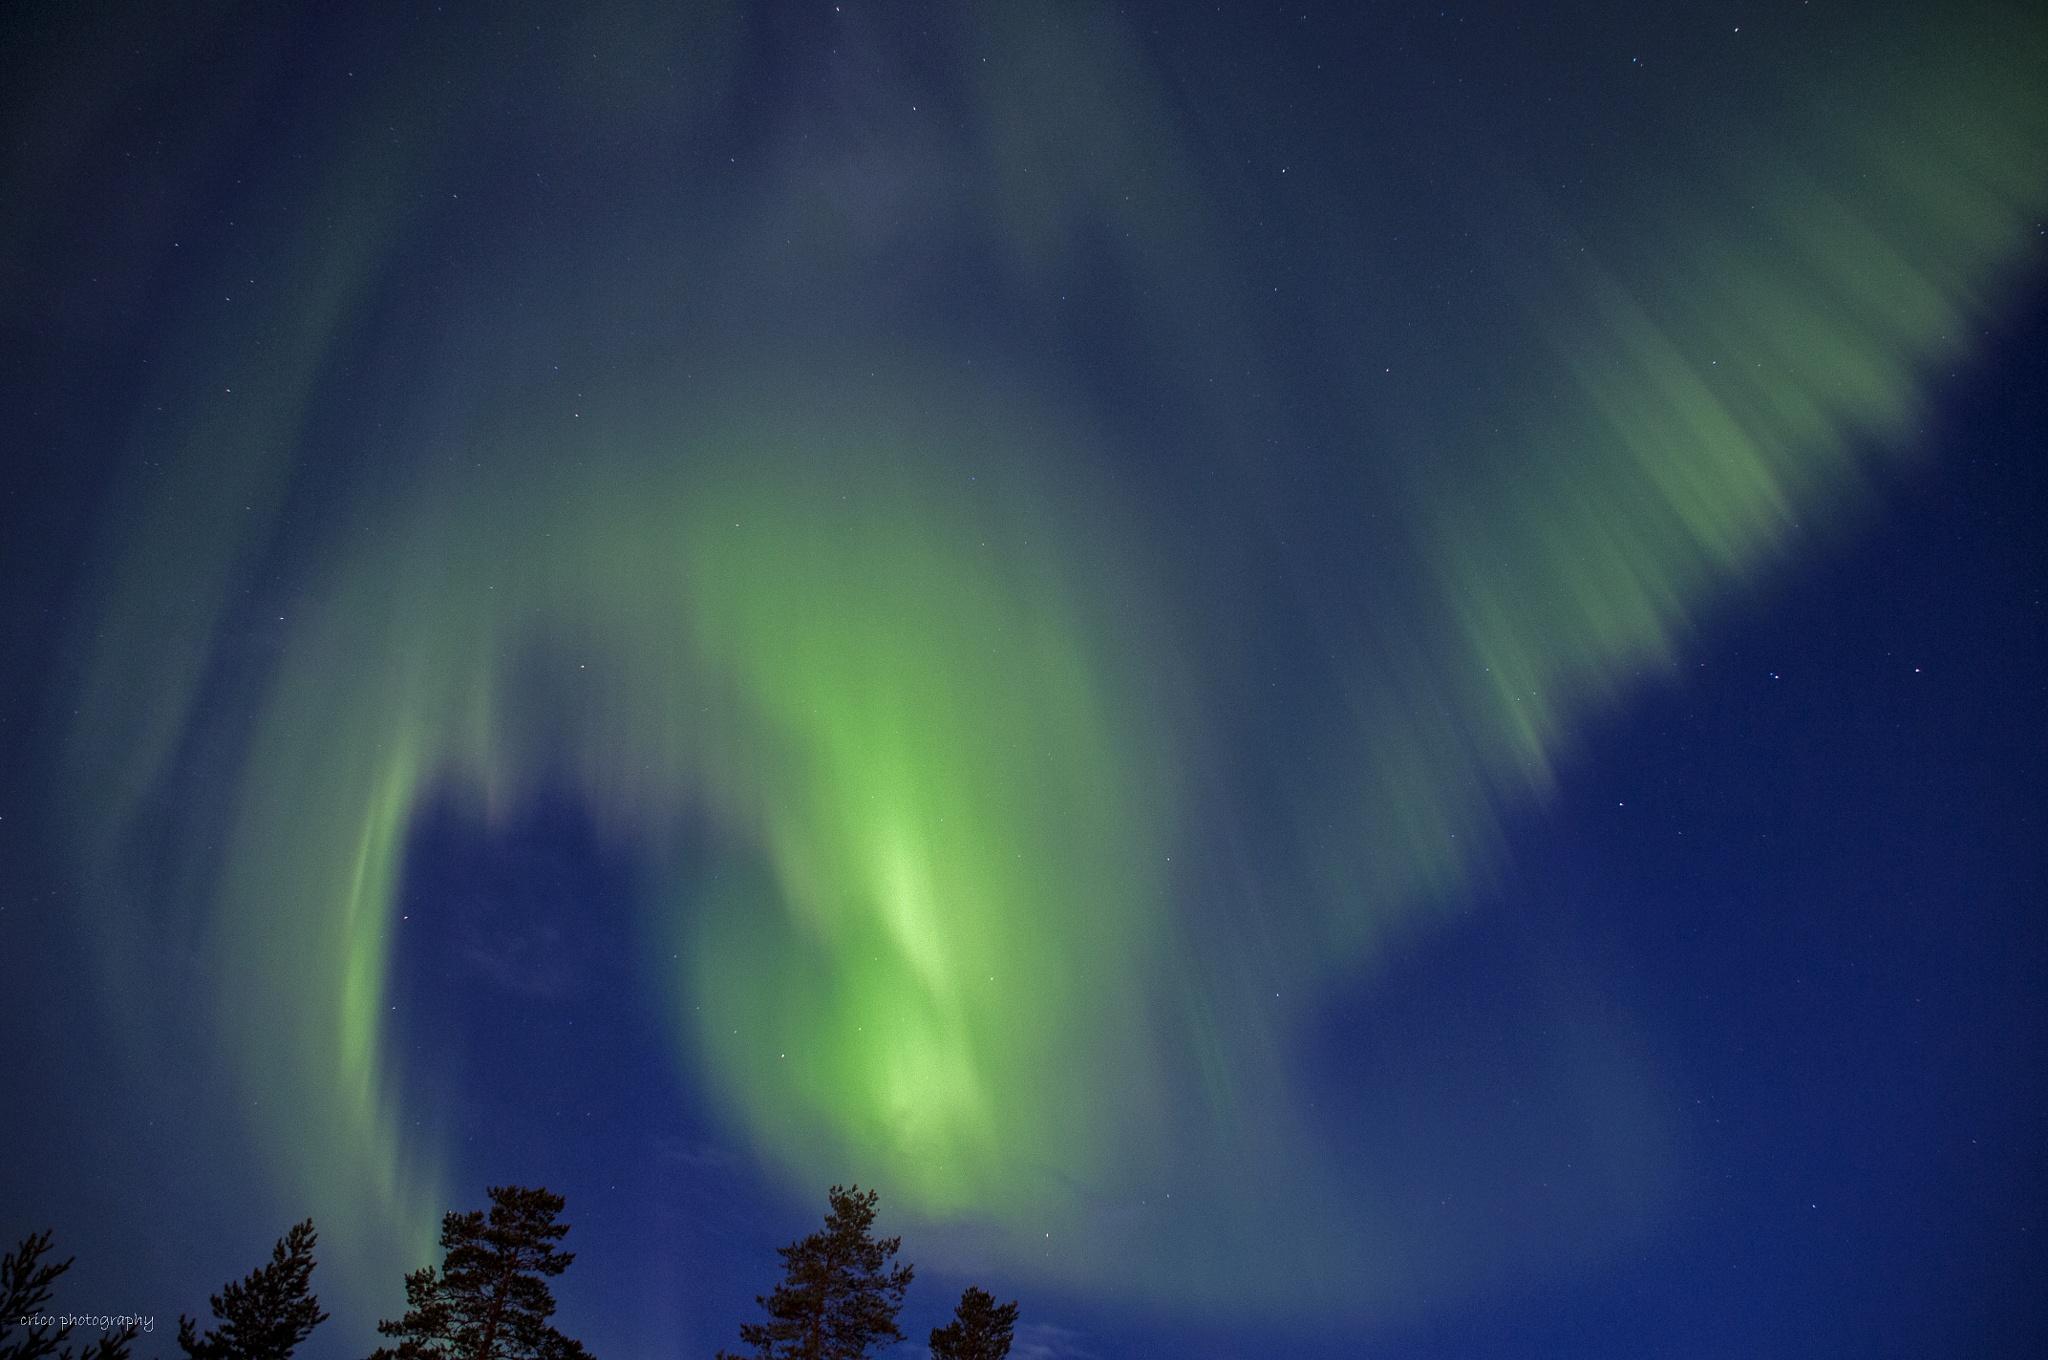 Aurora Borealis by cricco photography